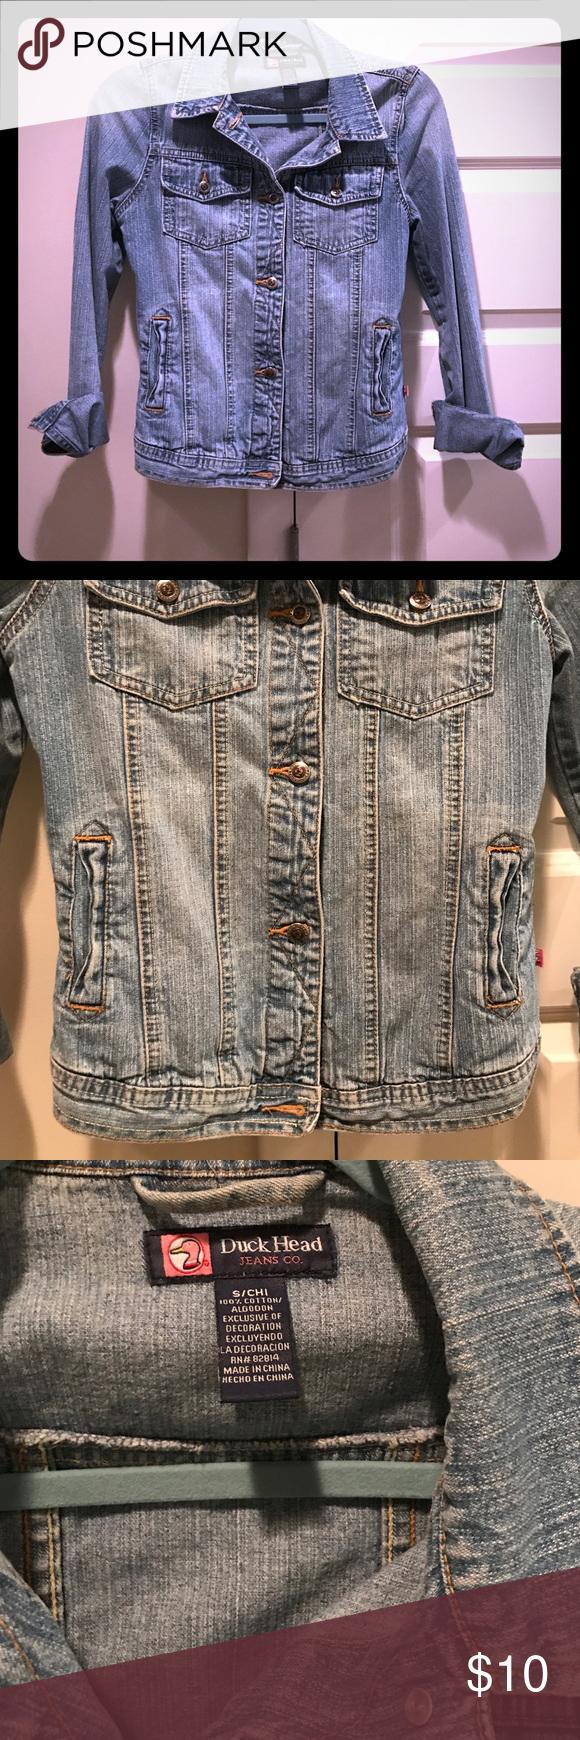 Light colored jean jacket Light colored jean jacket Duck Head Jean co Jackets & Coats Jean Jackets